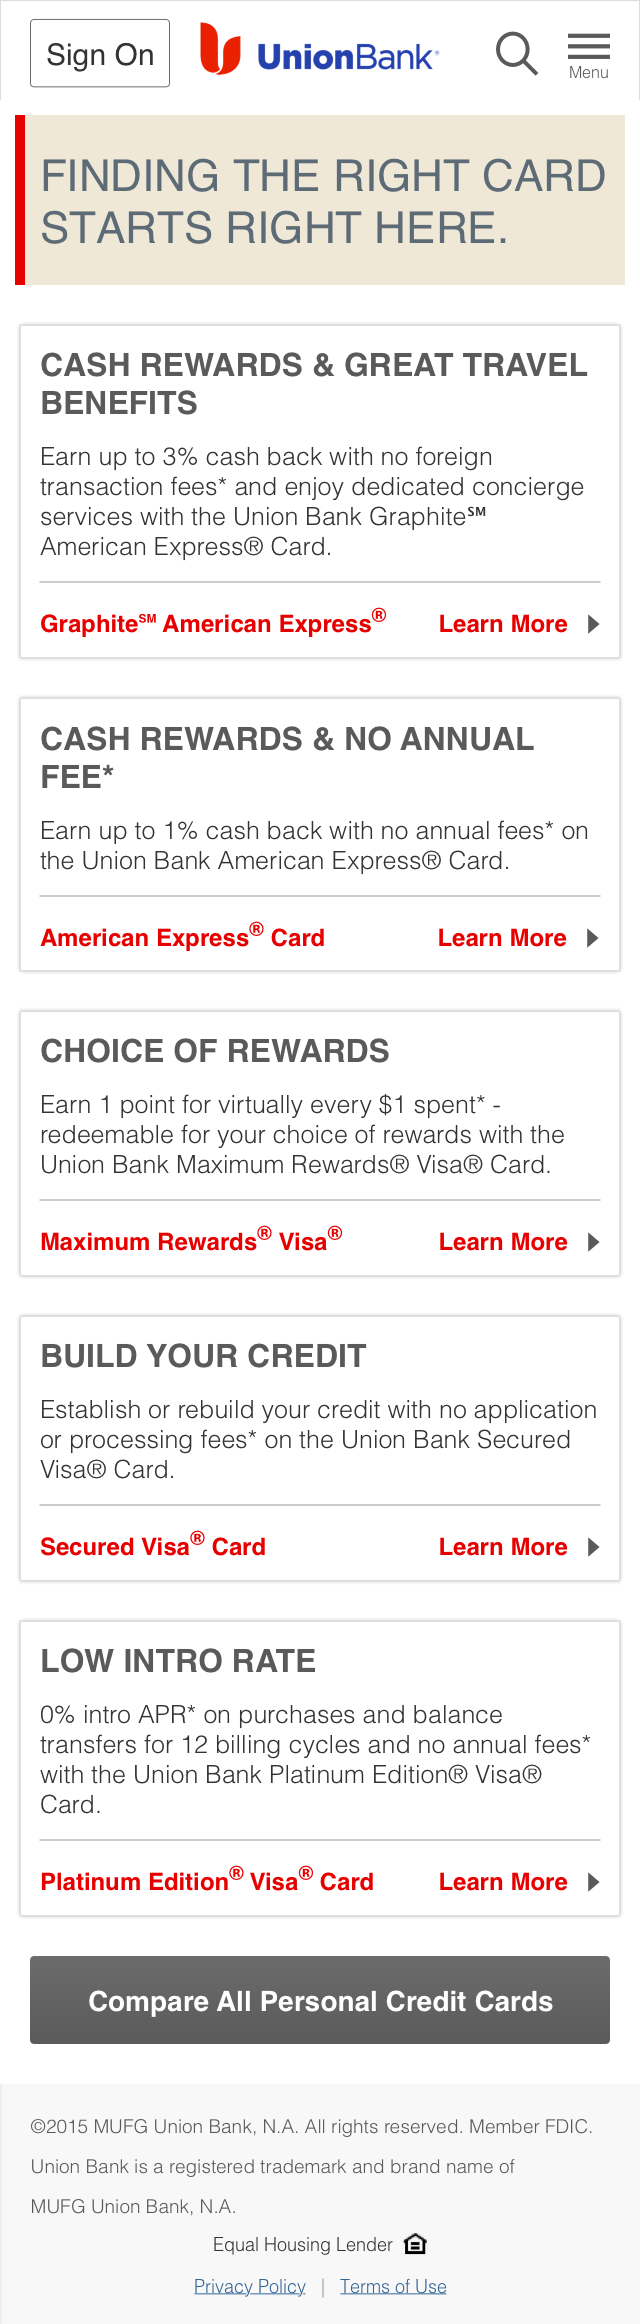 Personal - Credit Cards - Alt